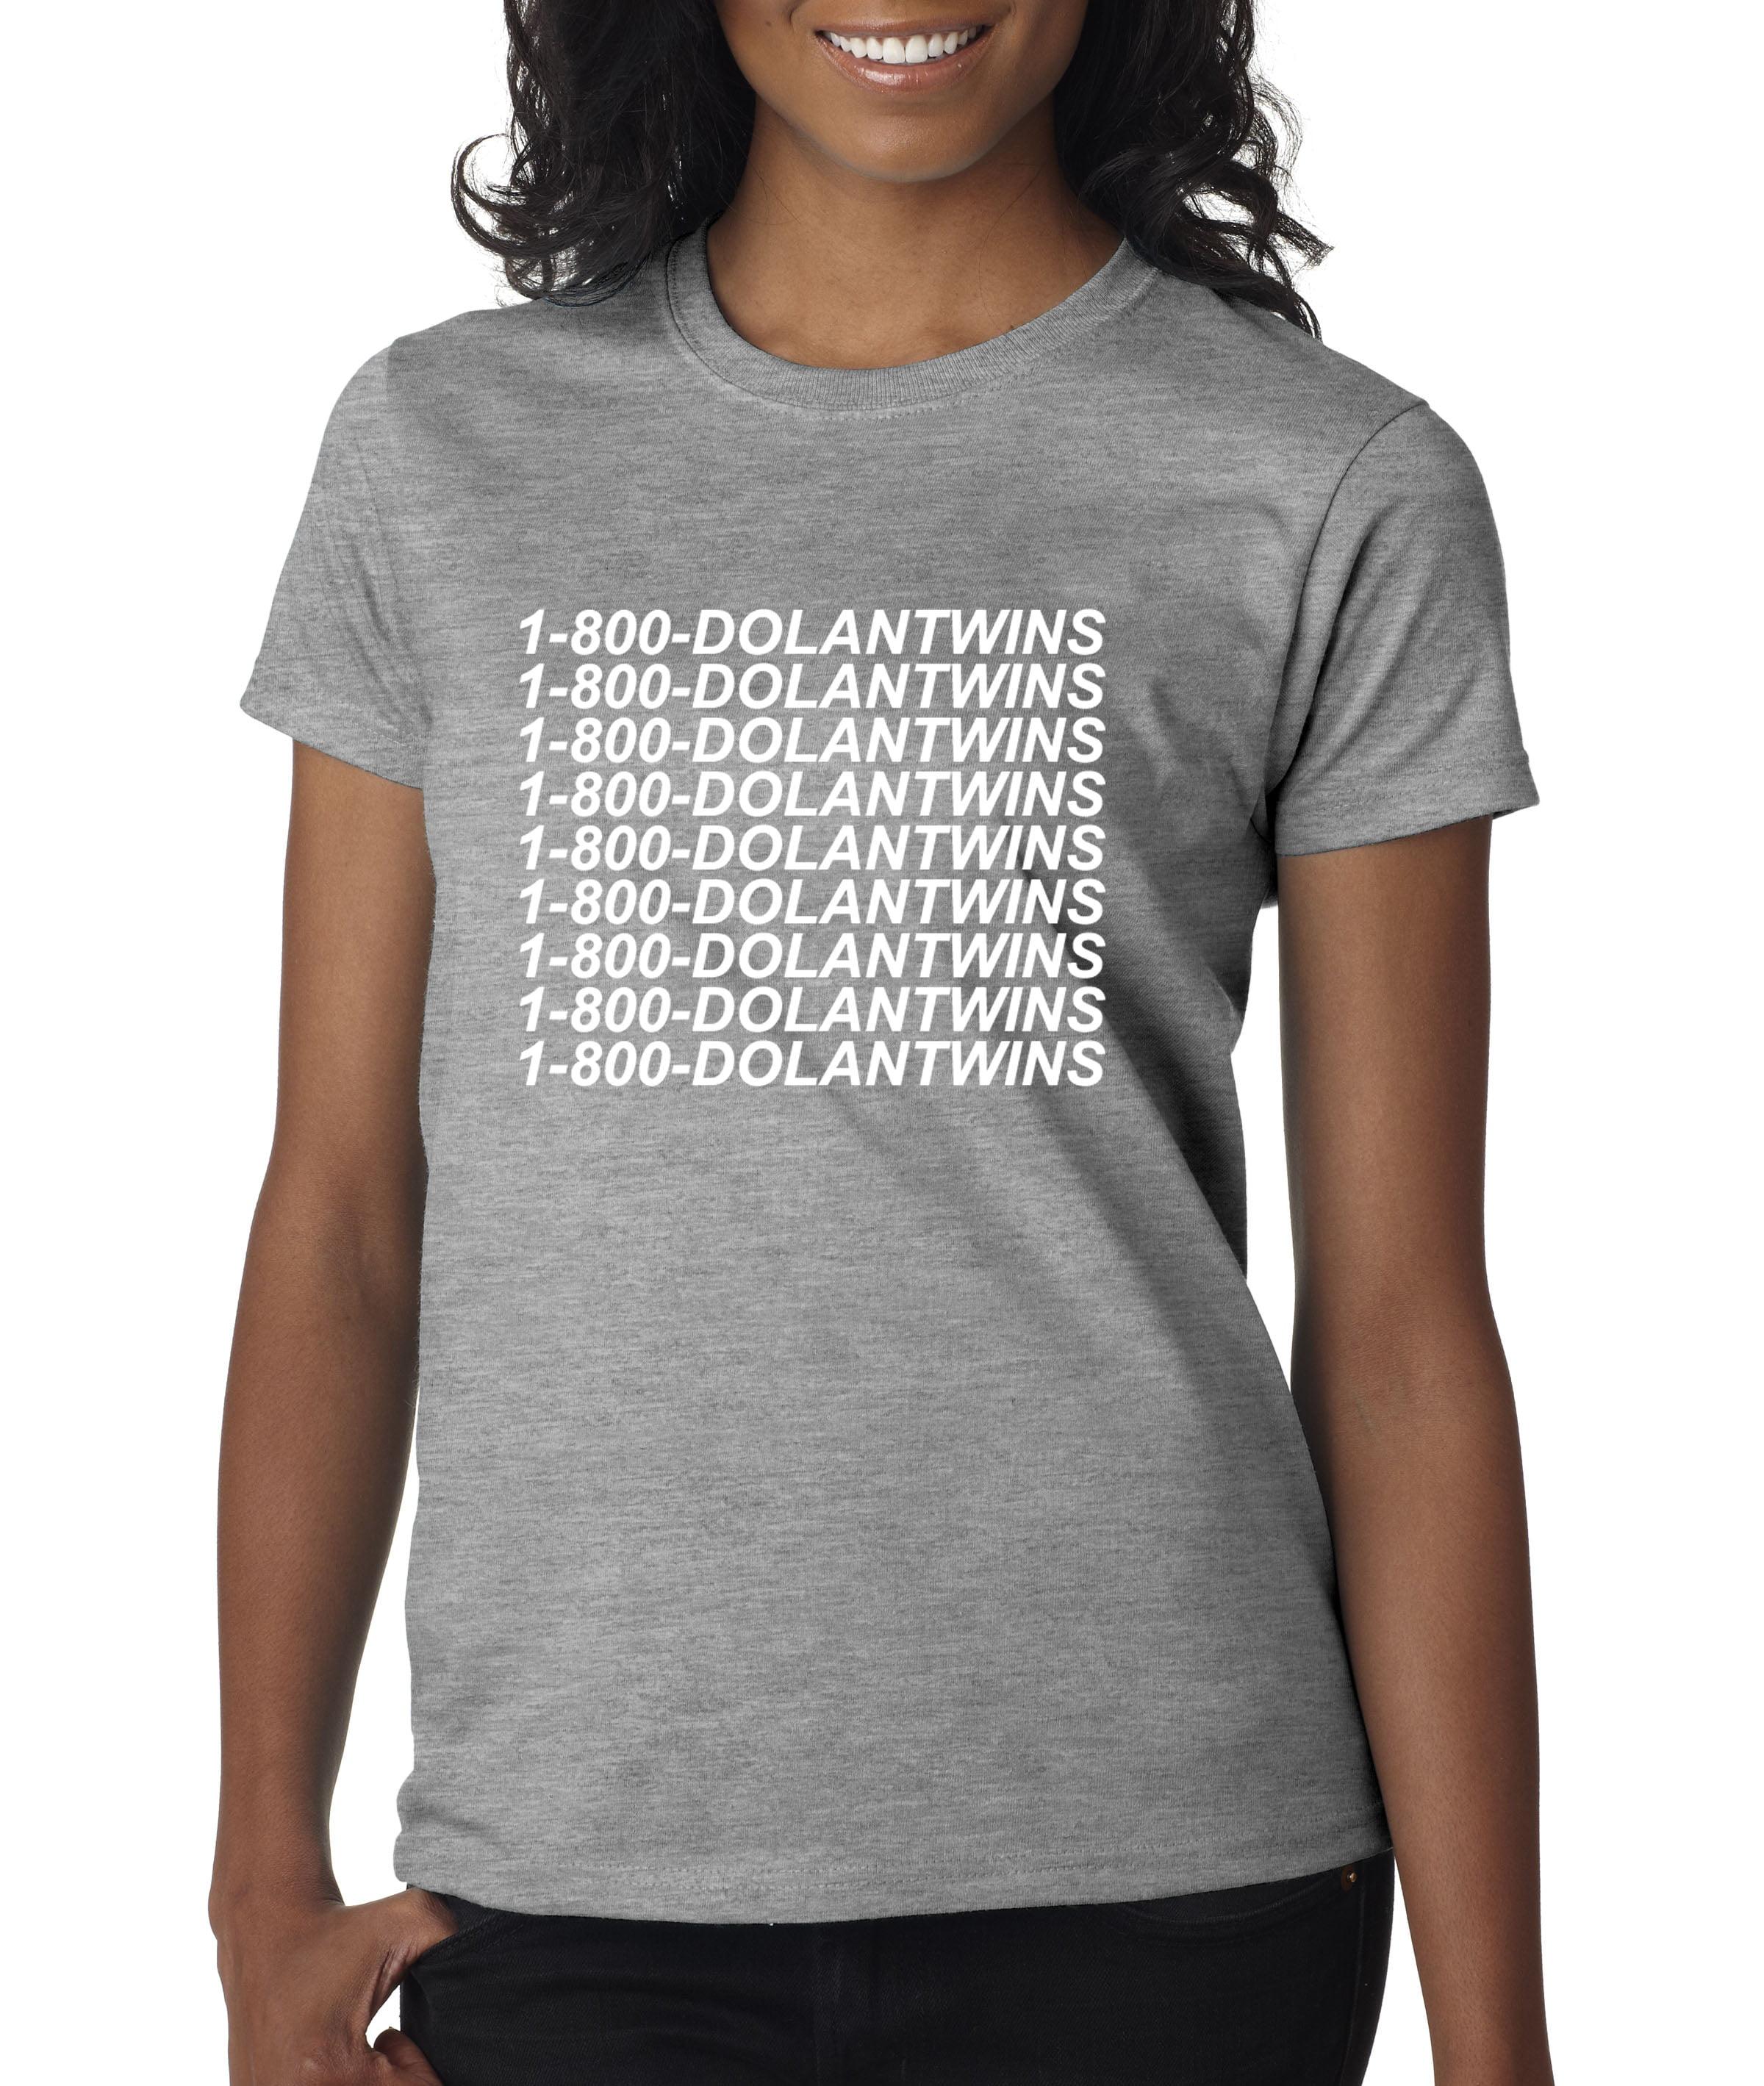 6fdeebf1d New Way - 761 - Women's T-Shirt 1-800-DOLANTWINS Dolan Twins Hotline Bling  XL Heather Grey - Walmart.com